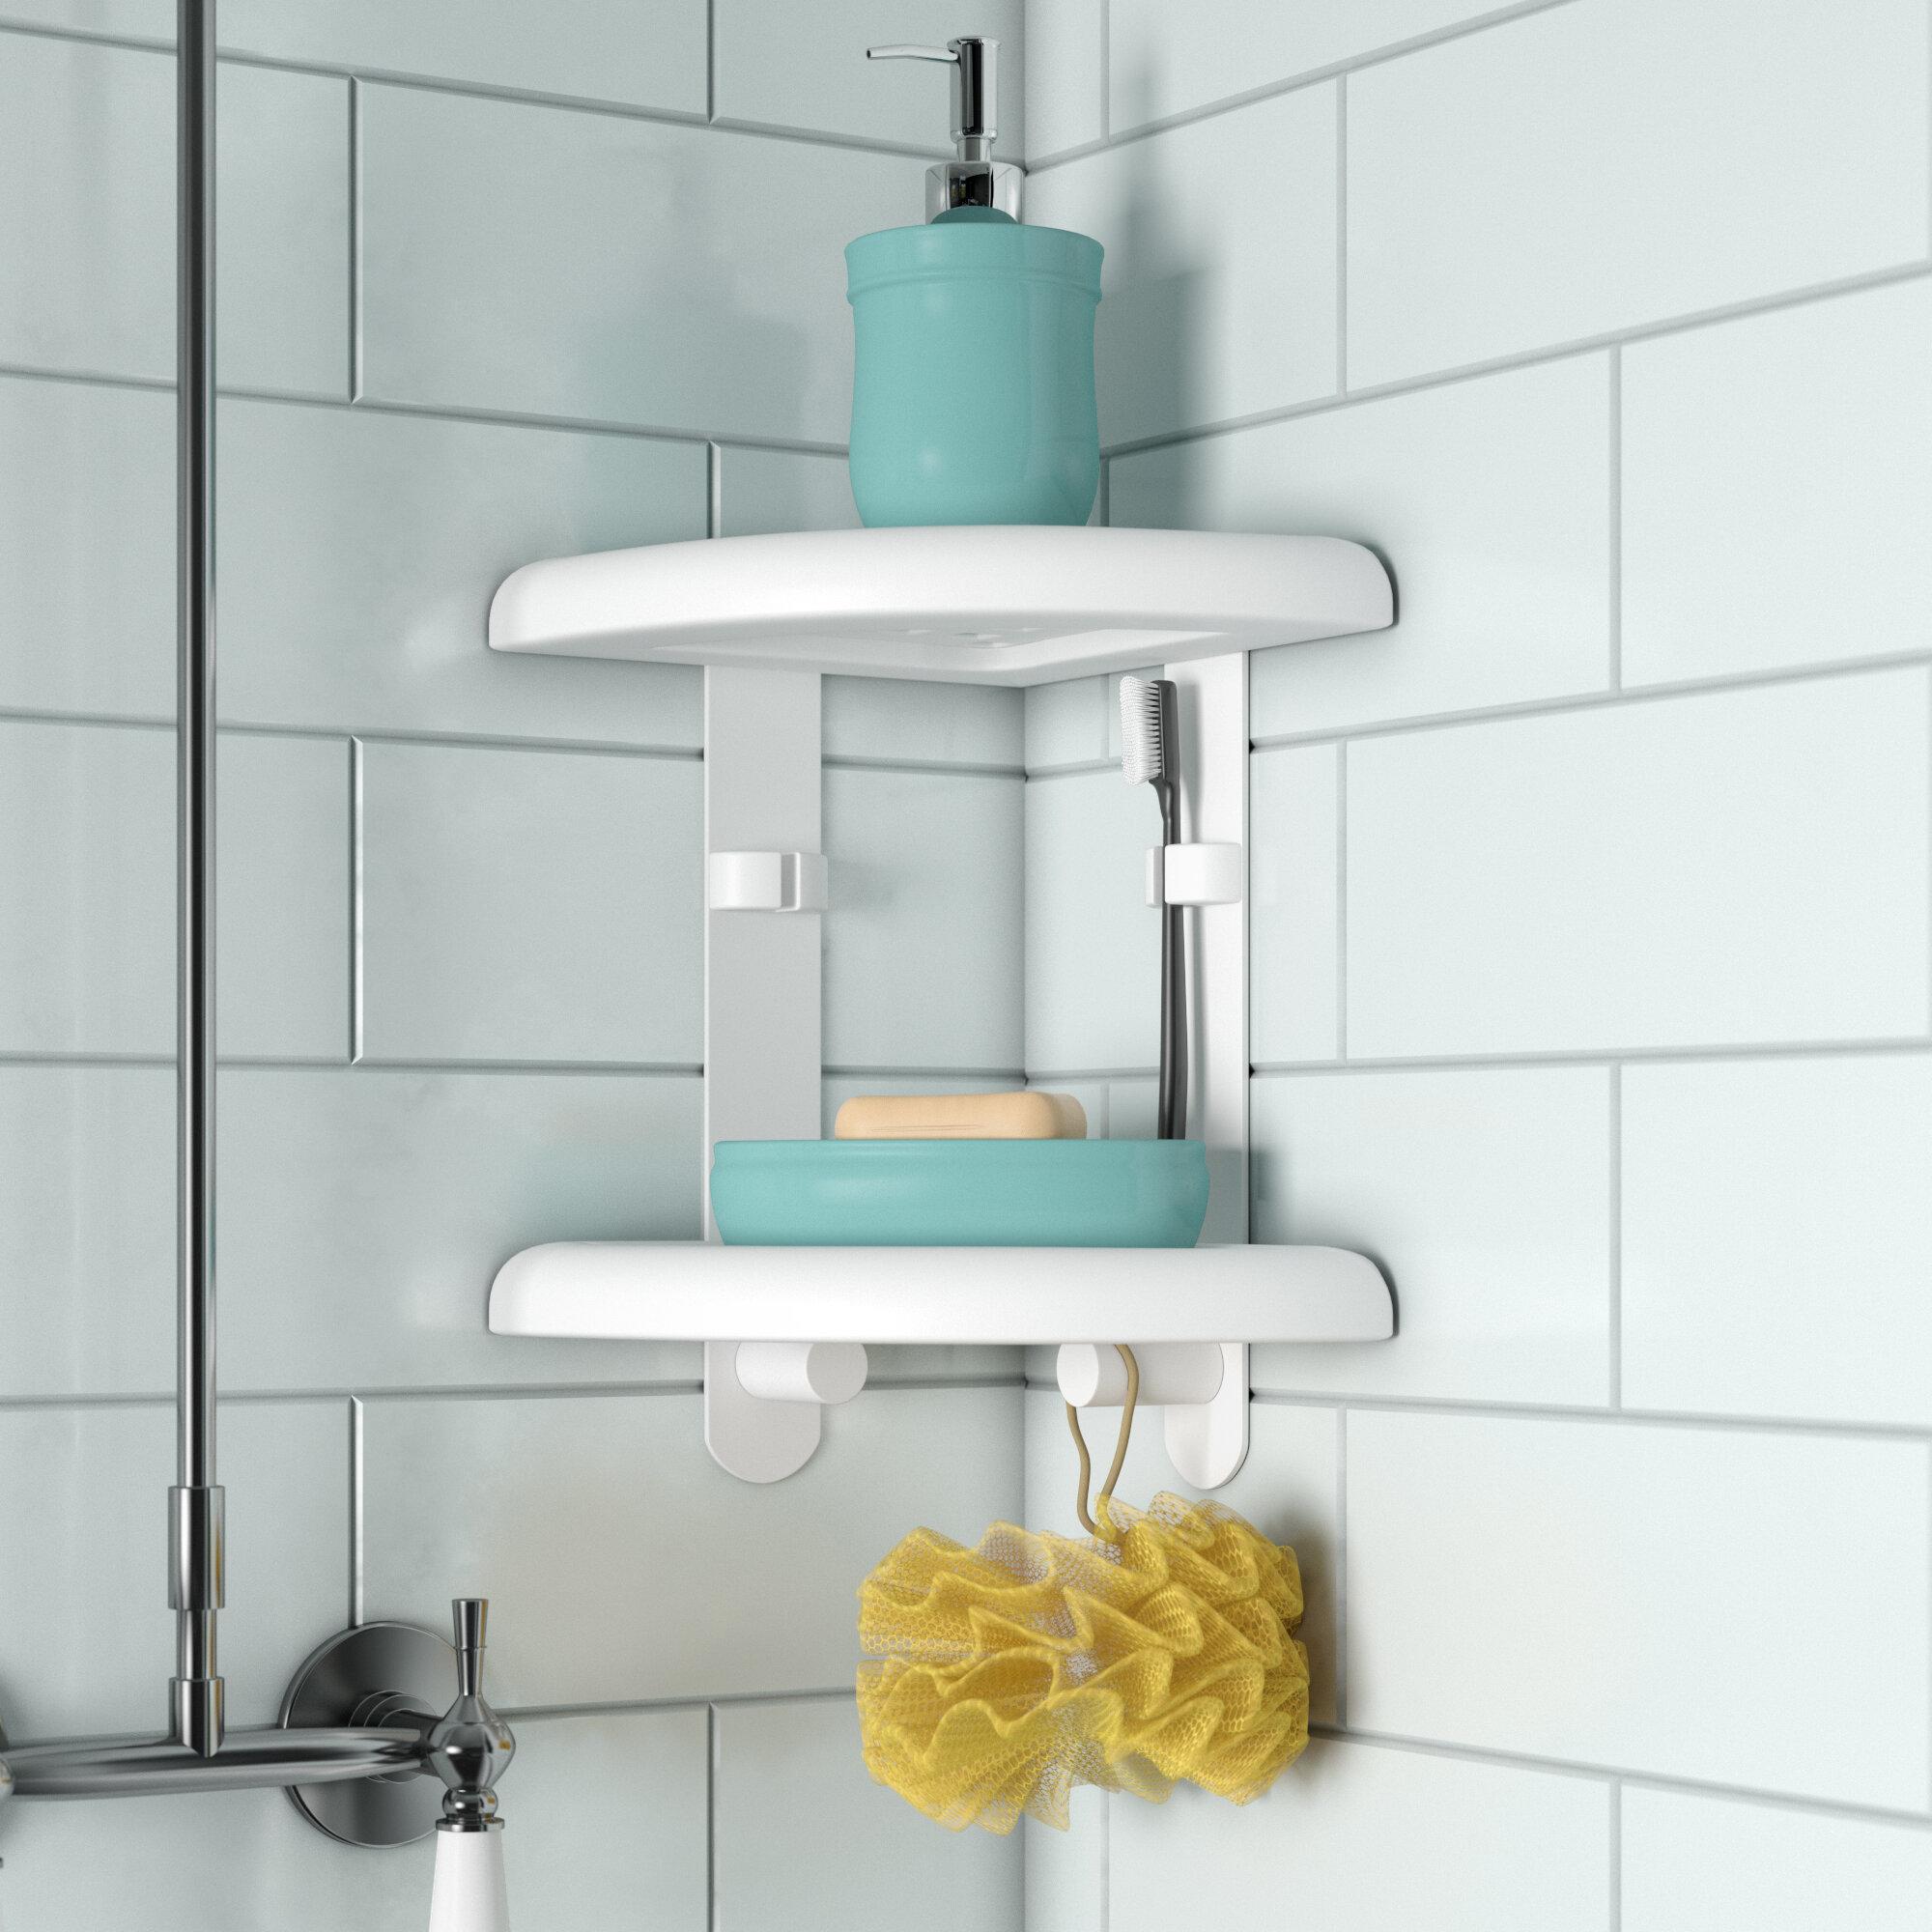 Plastic Shower Caddies You Ll Love In 2020 Wayfair